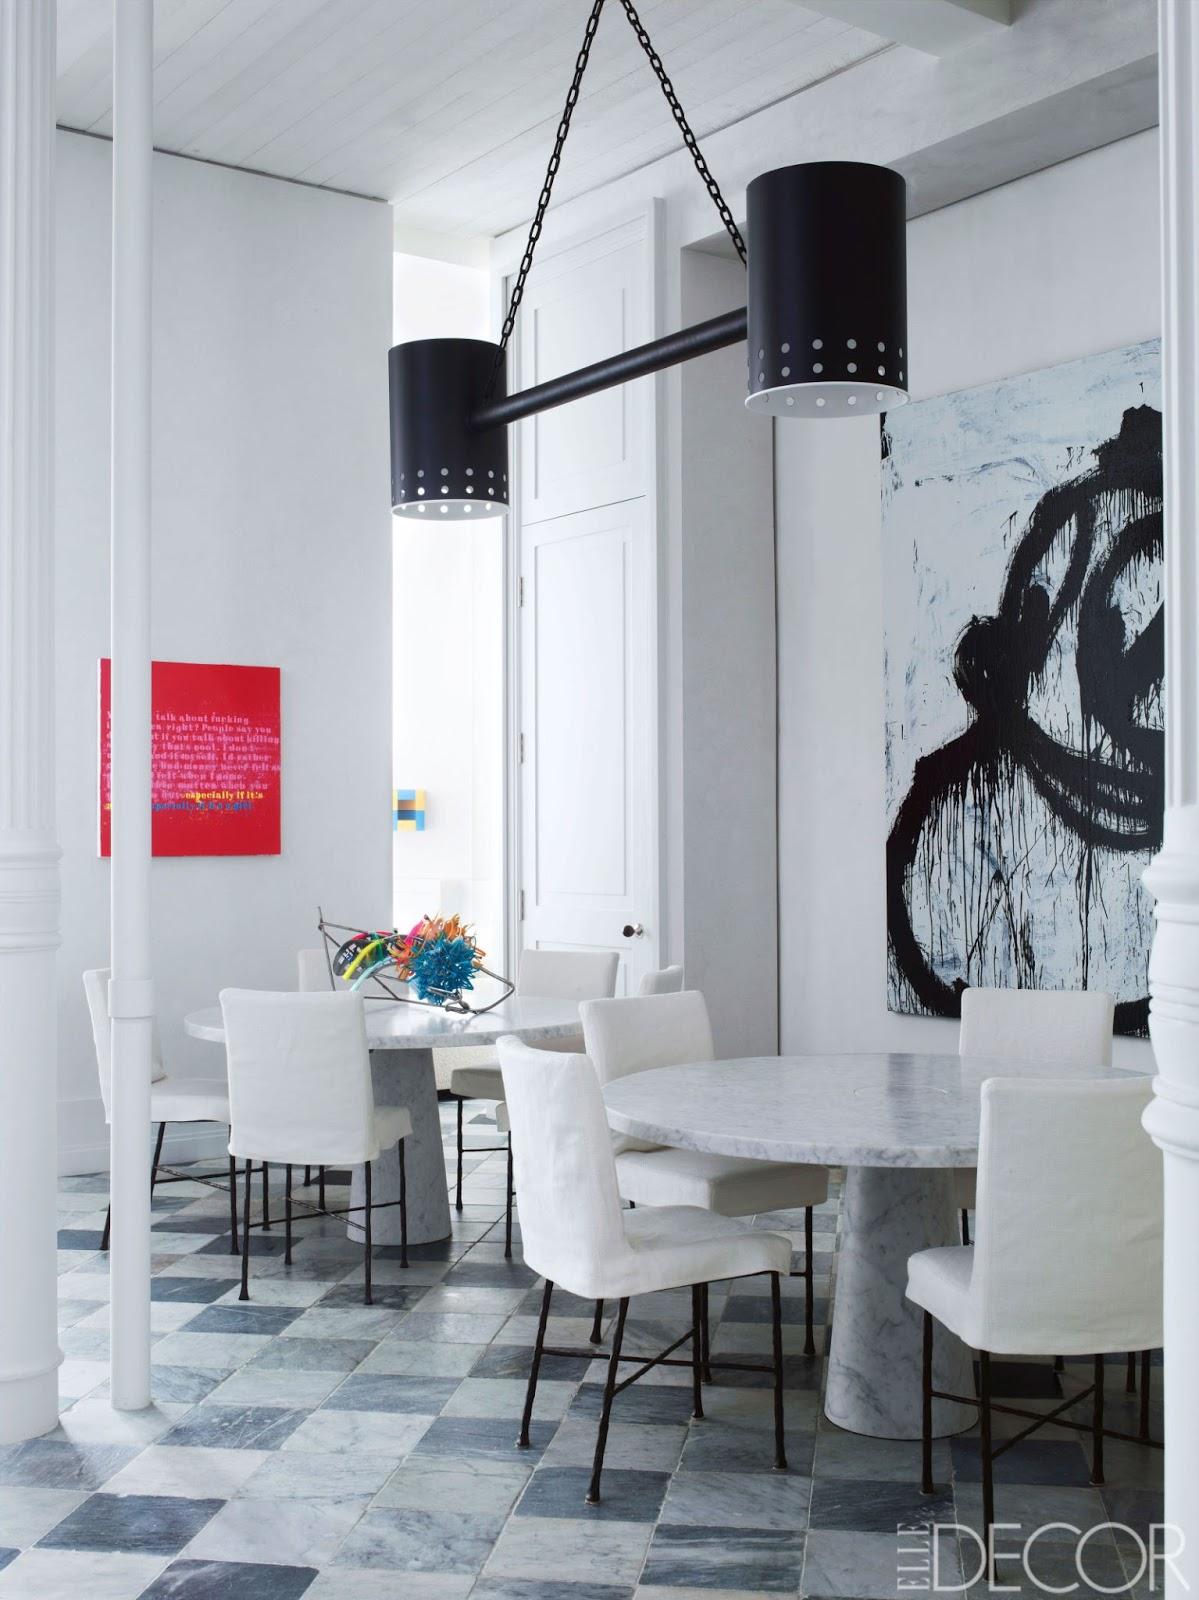 Elledecor Design Decorate House Interiors News G2837 Roberts Haynes Soho Loft Tour